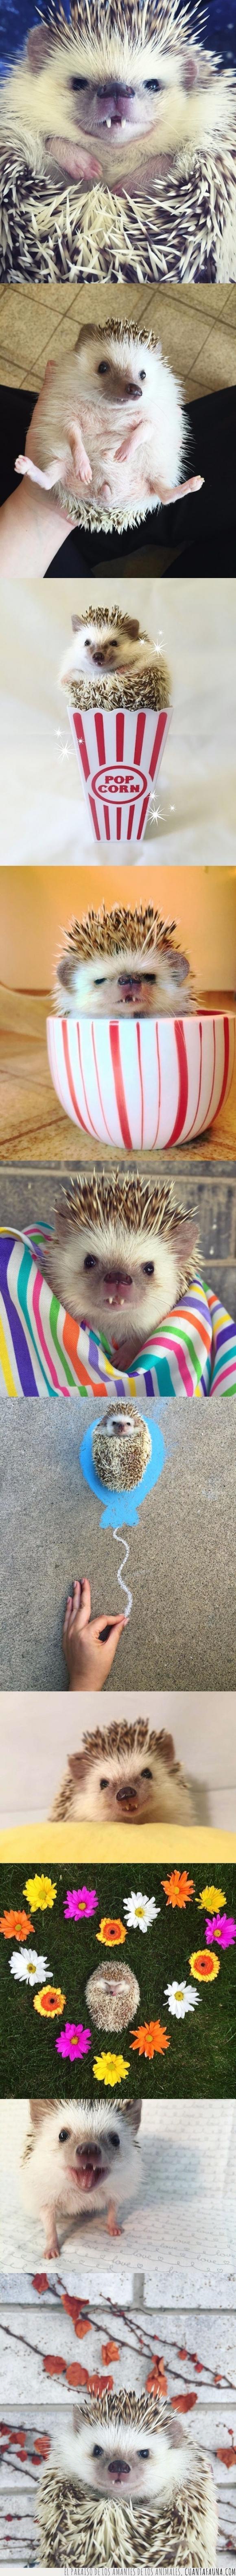 colmillo,dientes,erizo,huff,mascota